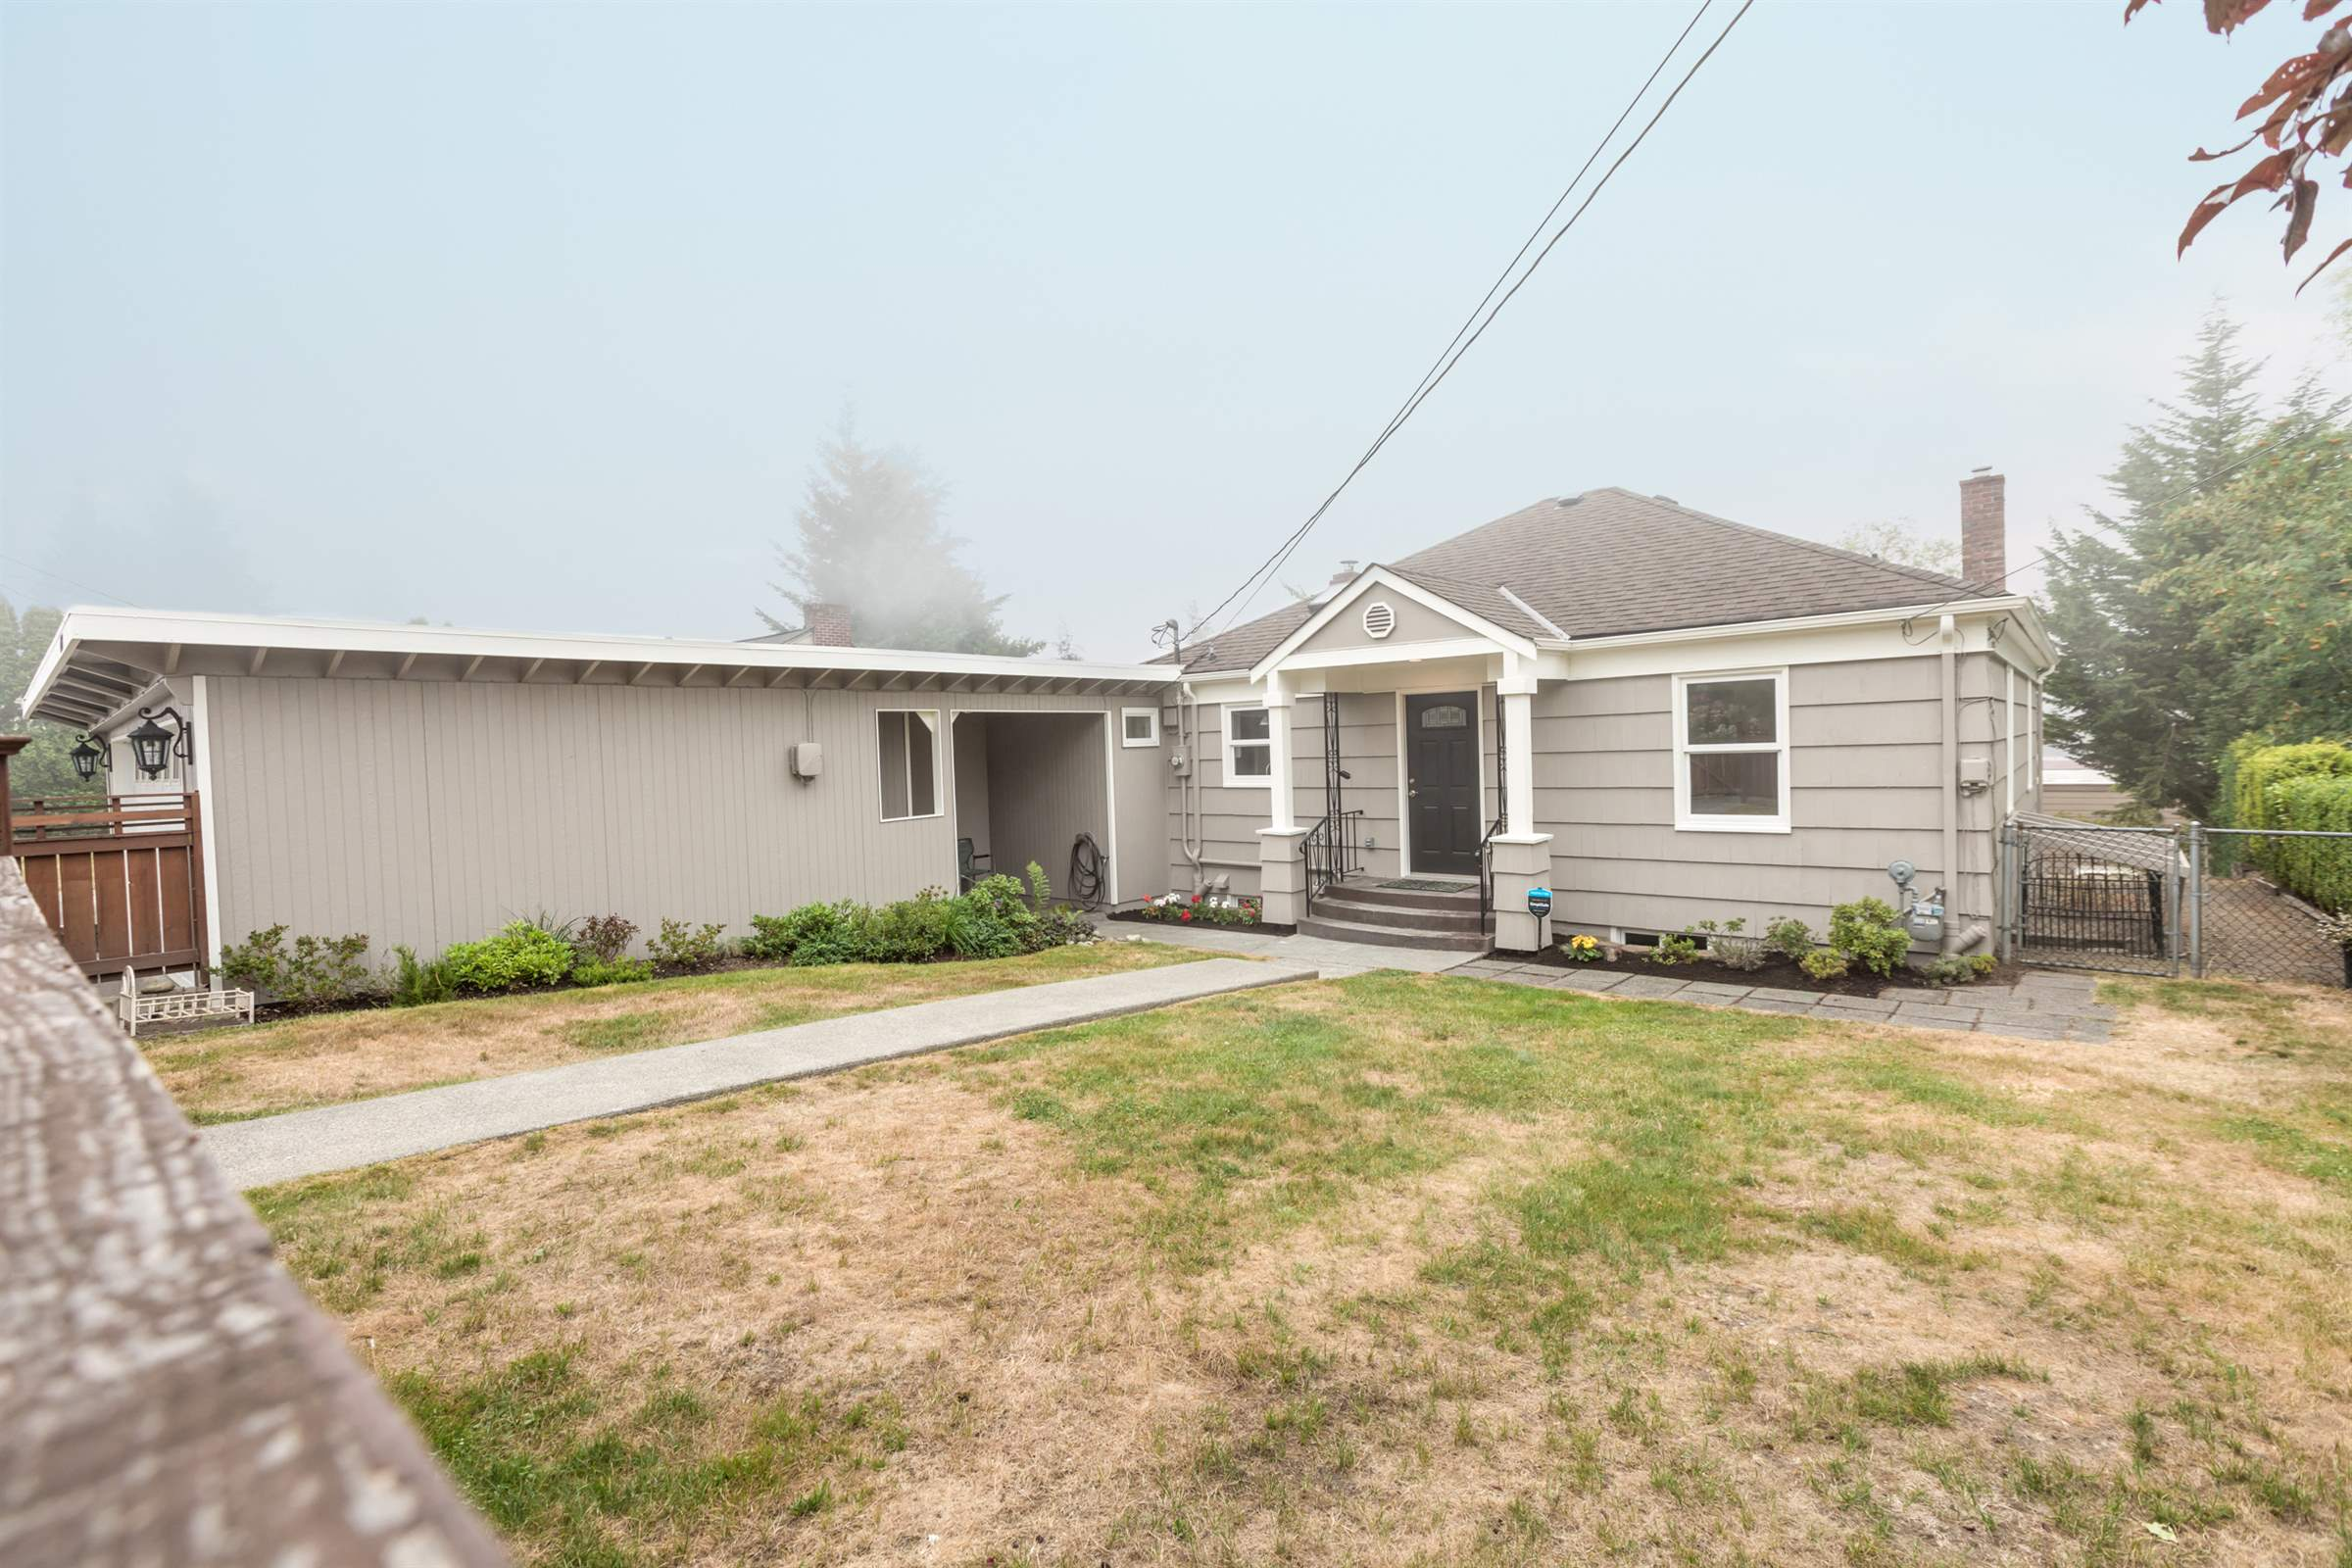 4713 Carlton Rd, Everett, WA 98203